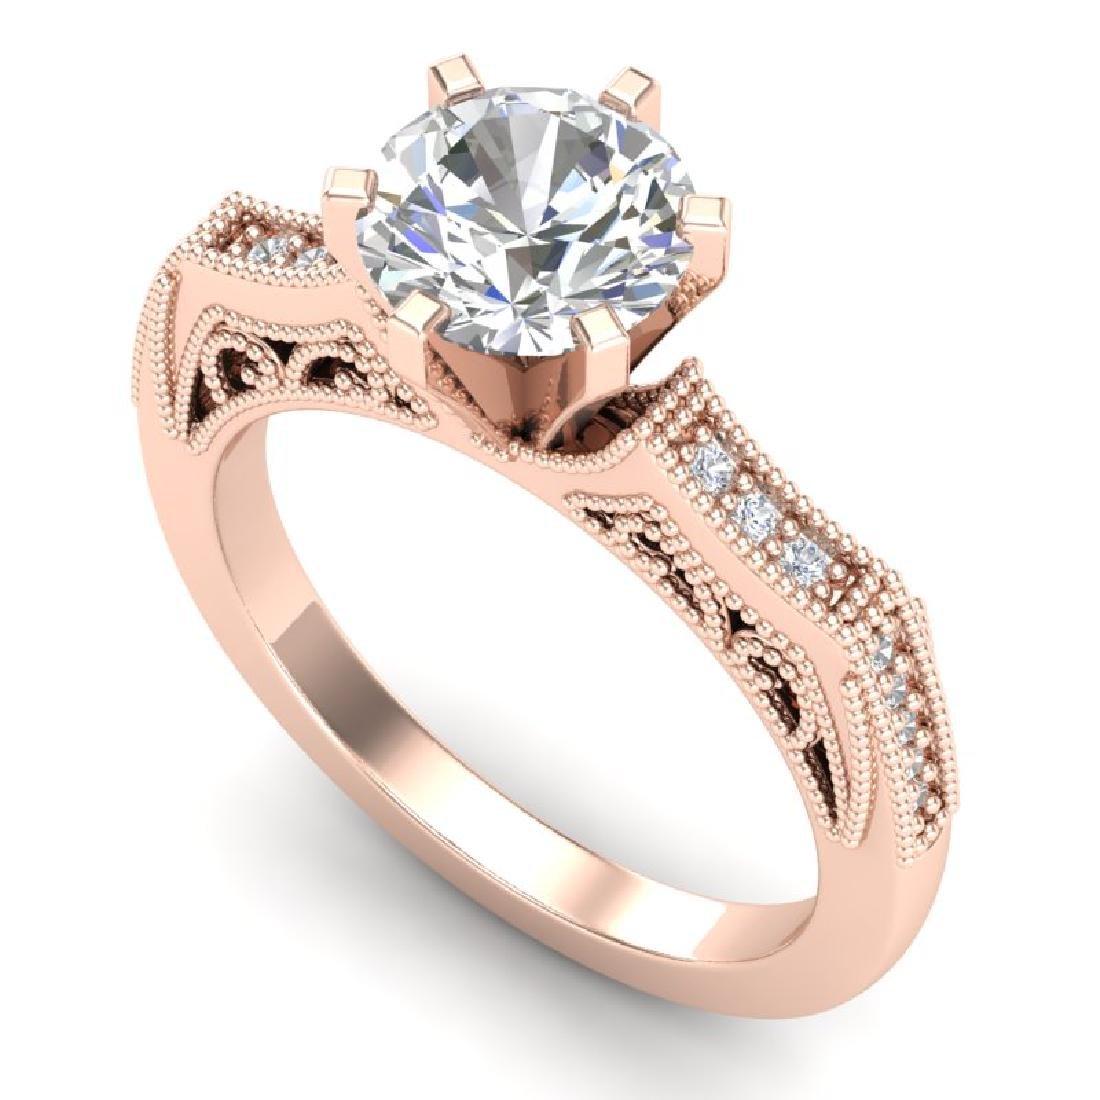 1.51 CTW VS/SI Diamond Solitaire Art Deco Ring 18K Rose